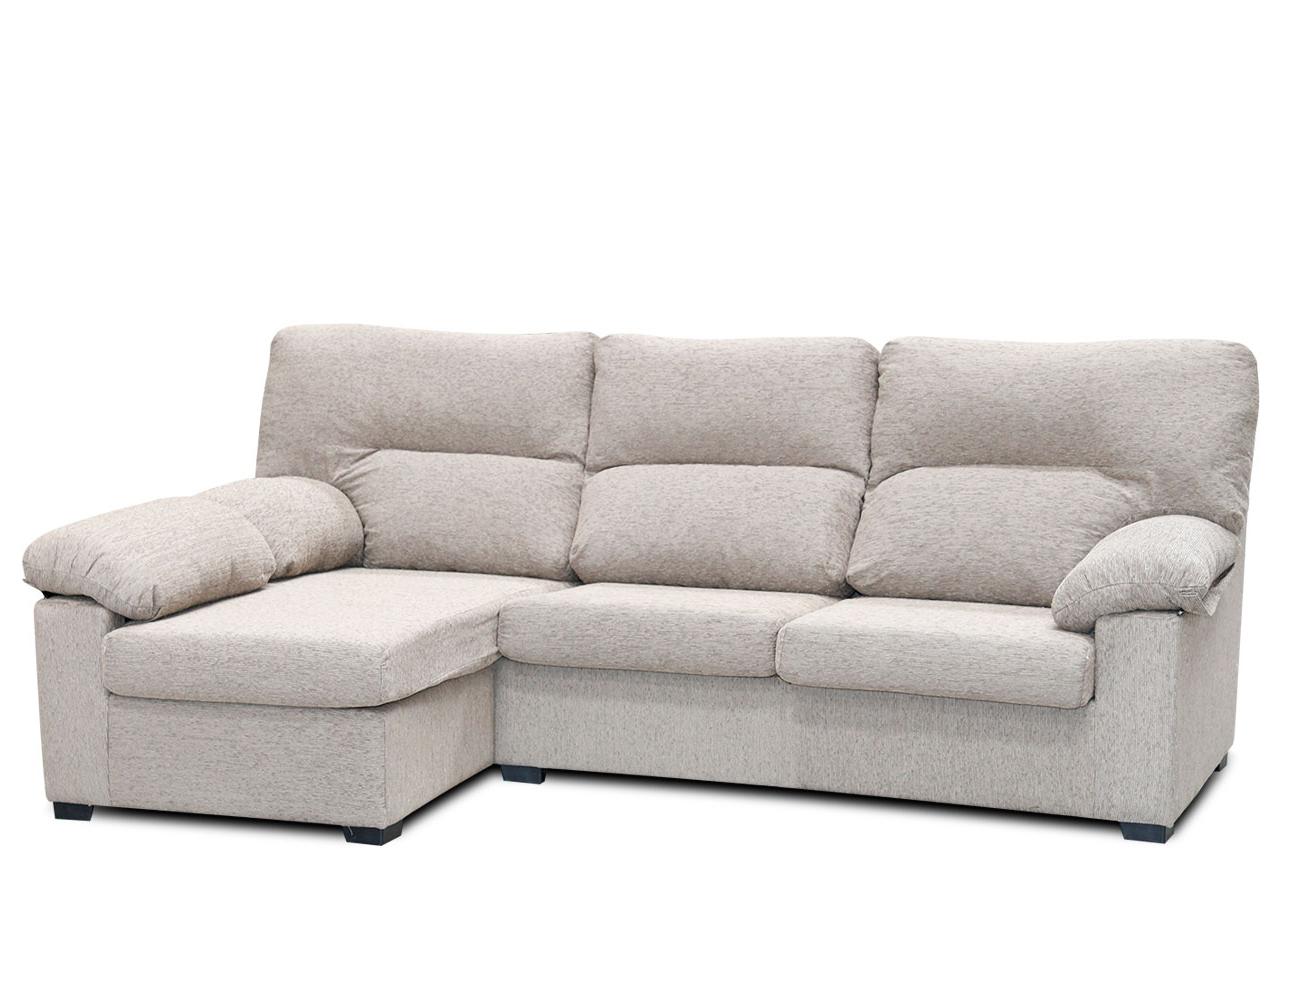 Sofas Chaise Longue Baratos 9fdy A Sofa S Chaiselongue Tiendas De